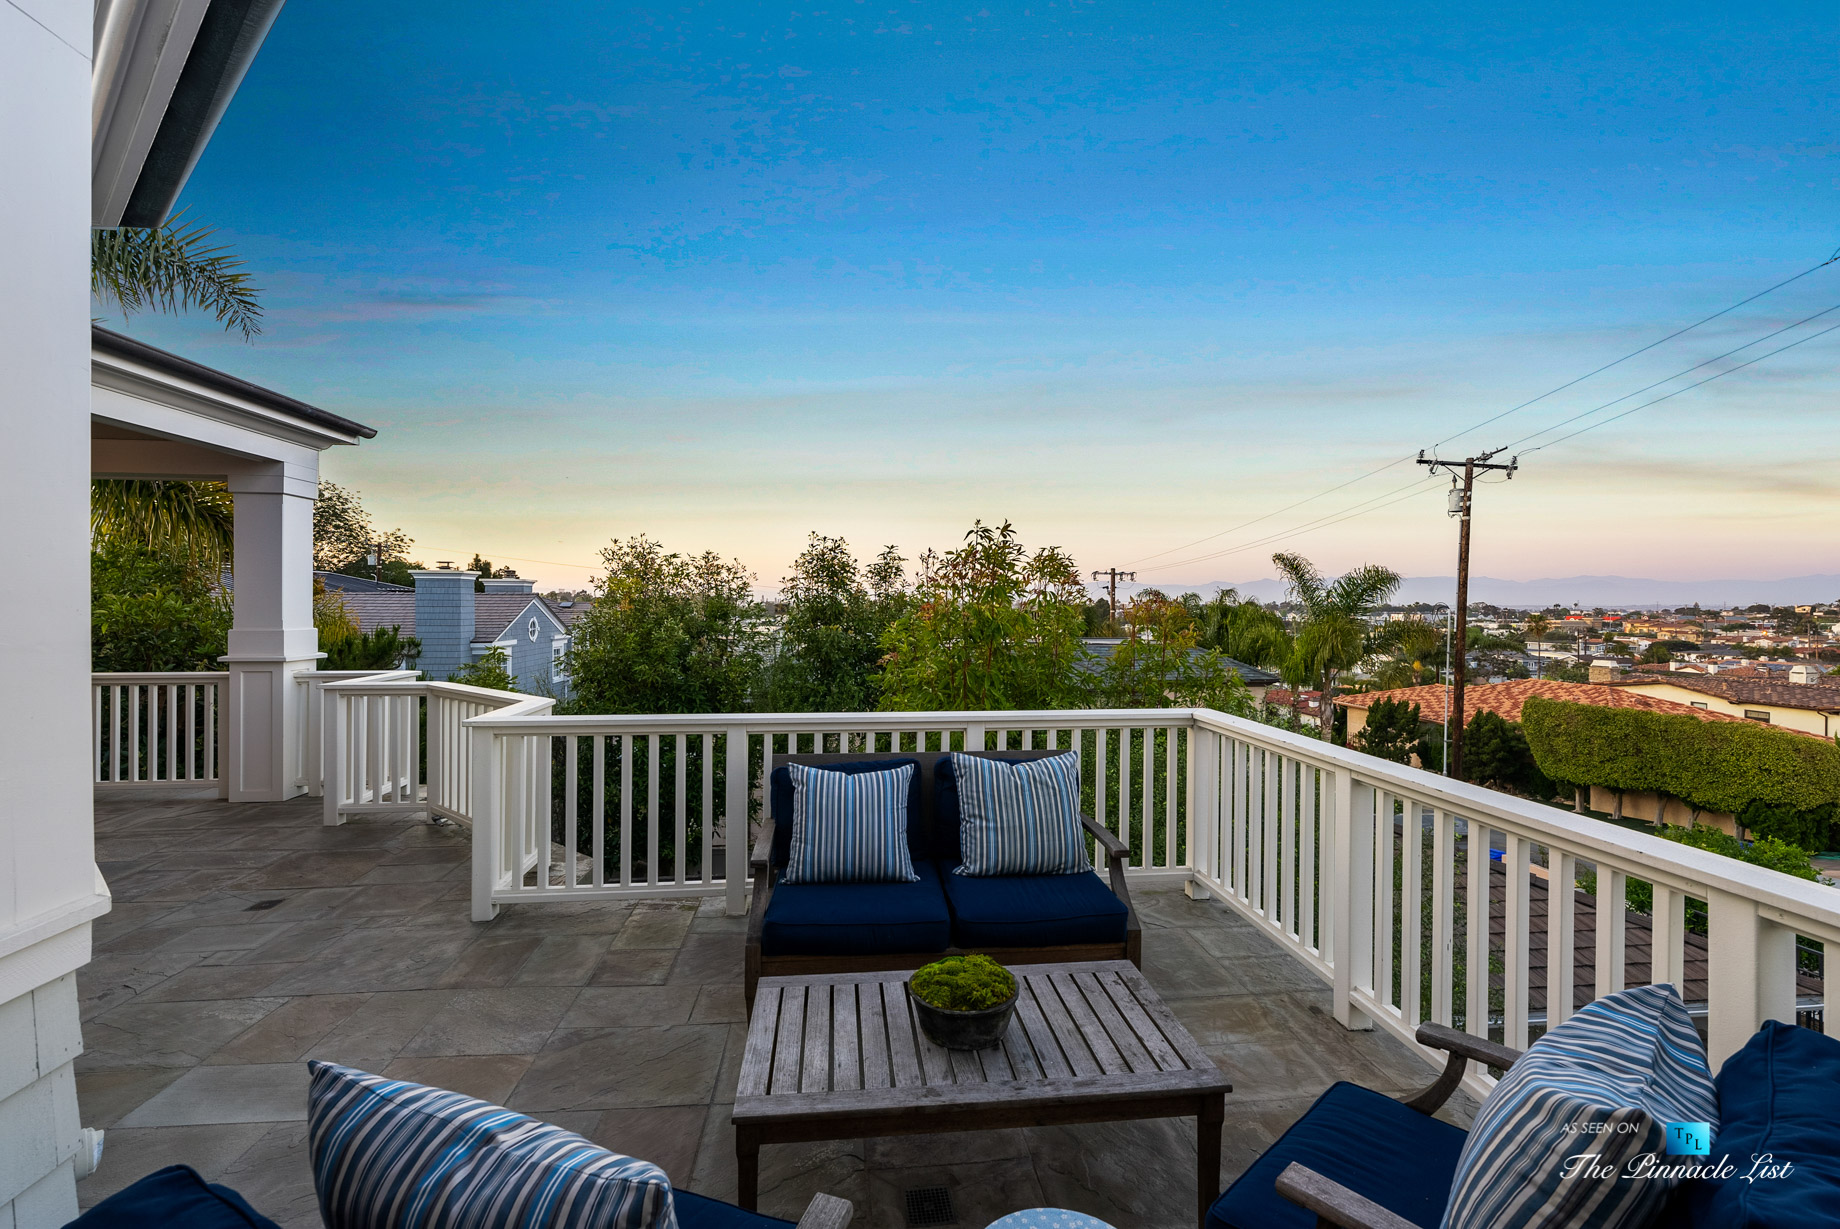 877 8th Street, Manhattan Beach, CA, USA - Top Level Patio Twilight Seating View